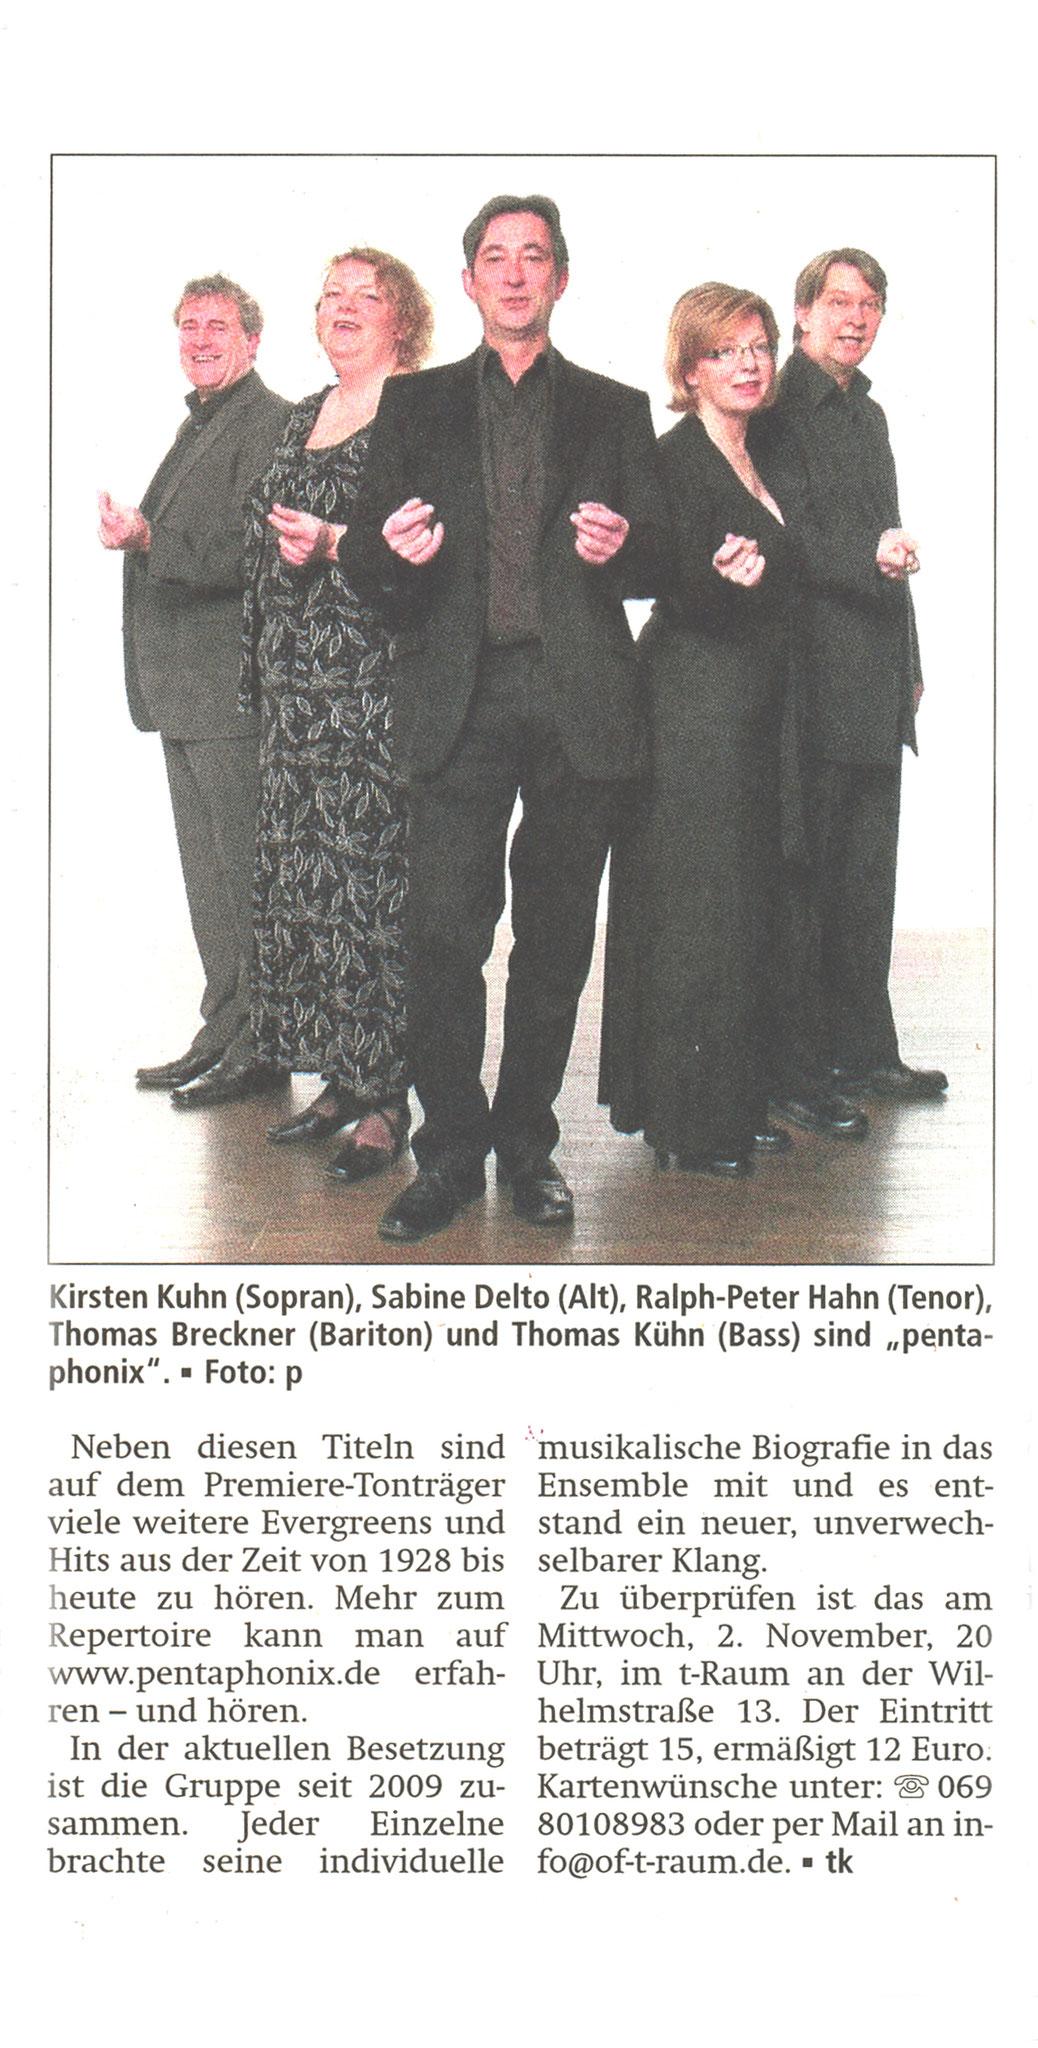 Offenbach Post, 26. Oktober 2016